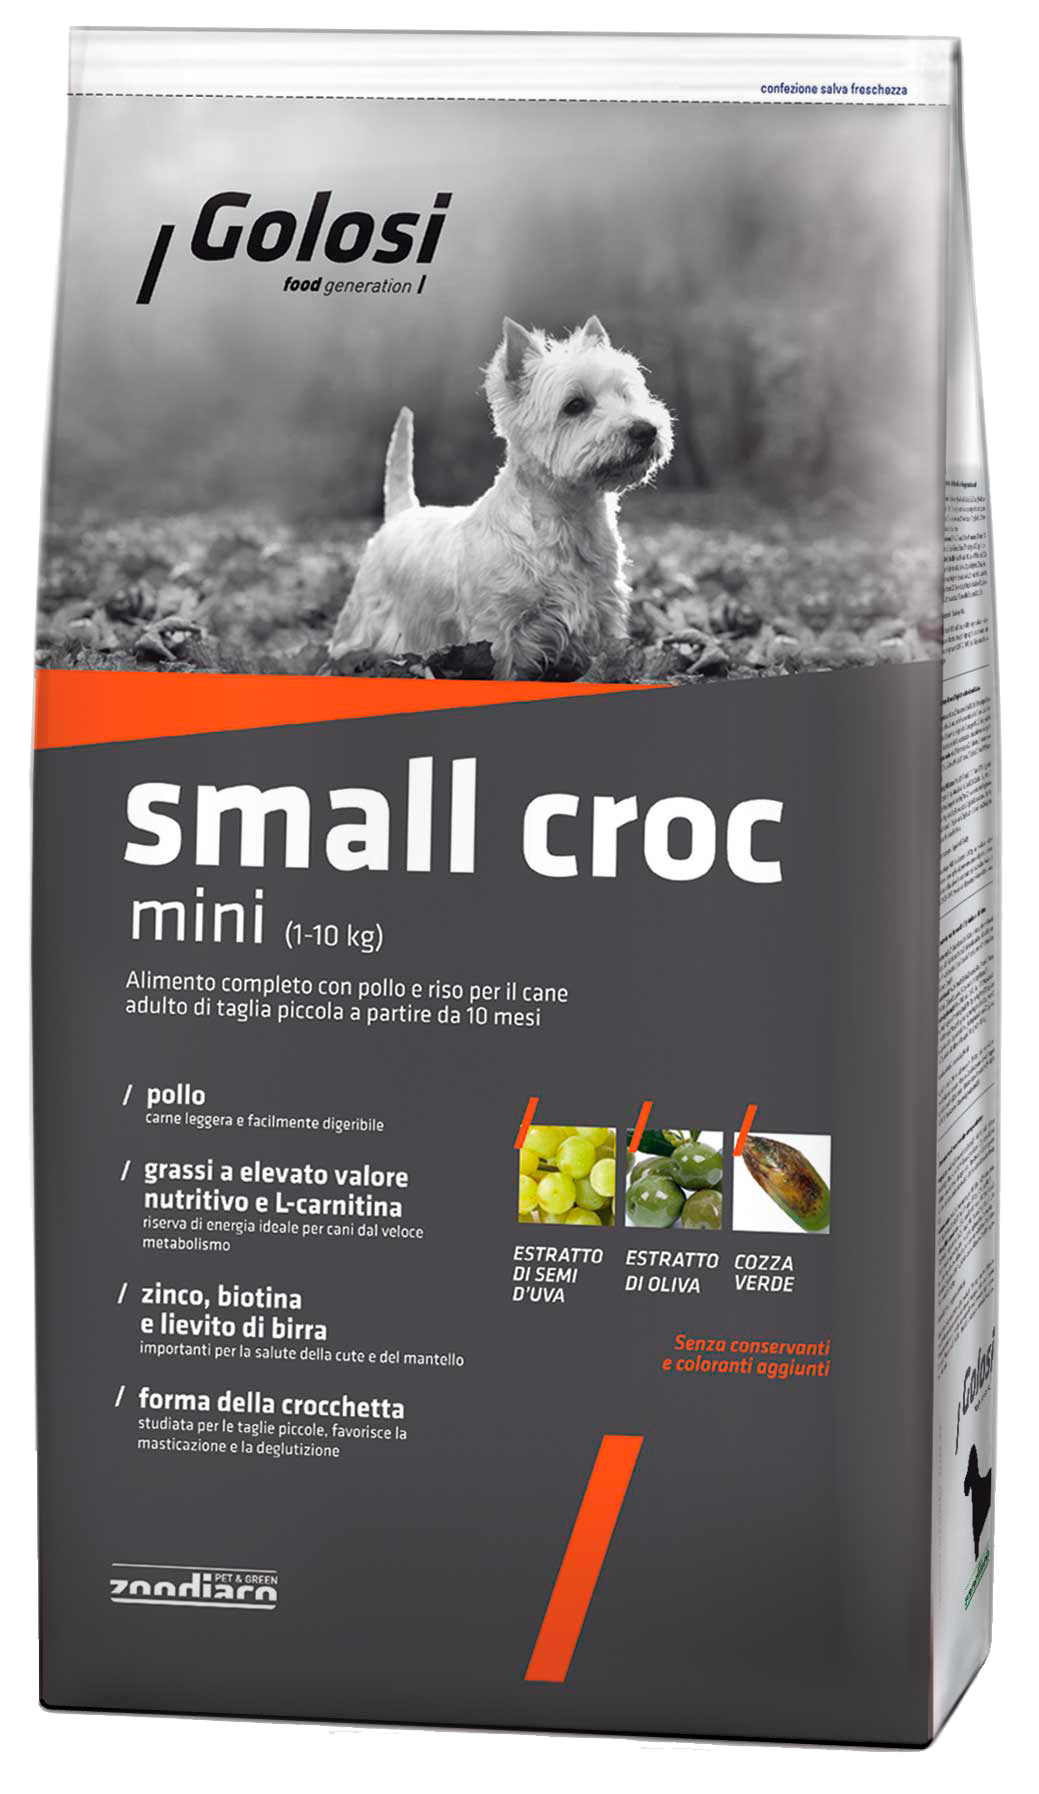 Golosi Small Croc Mini корм для собак со вкусом курицы и риса, 2кг